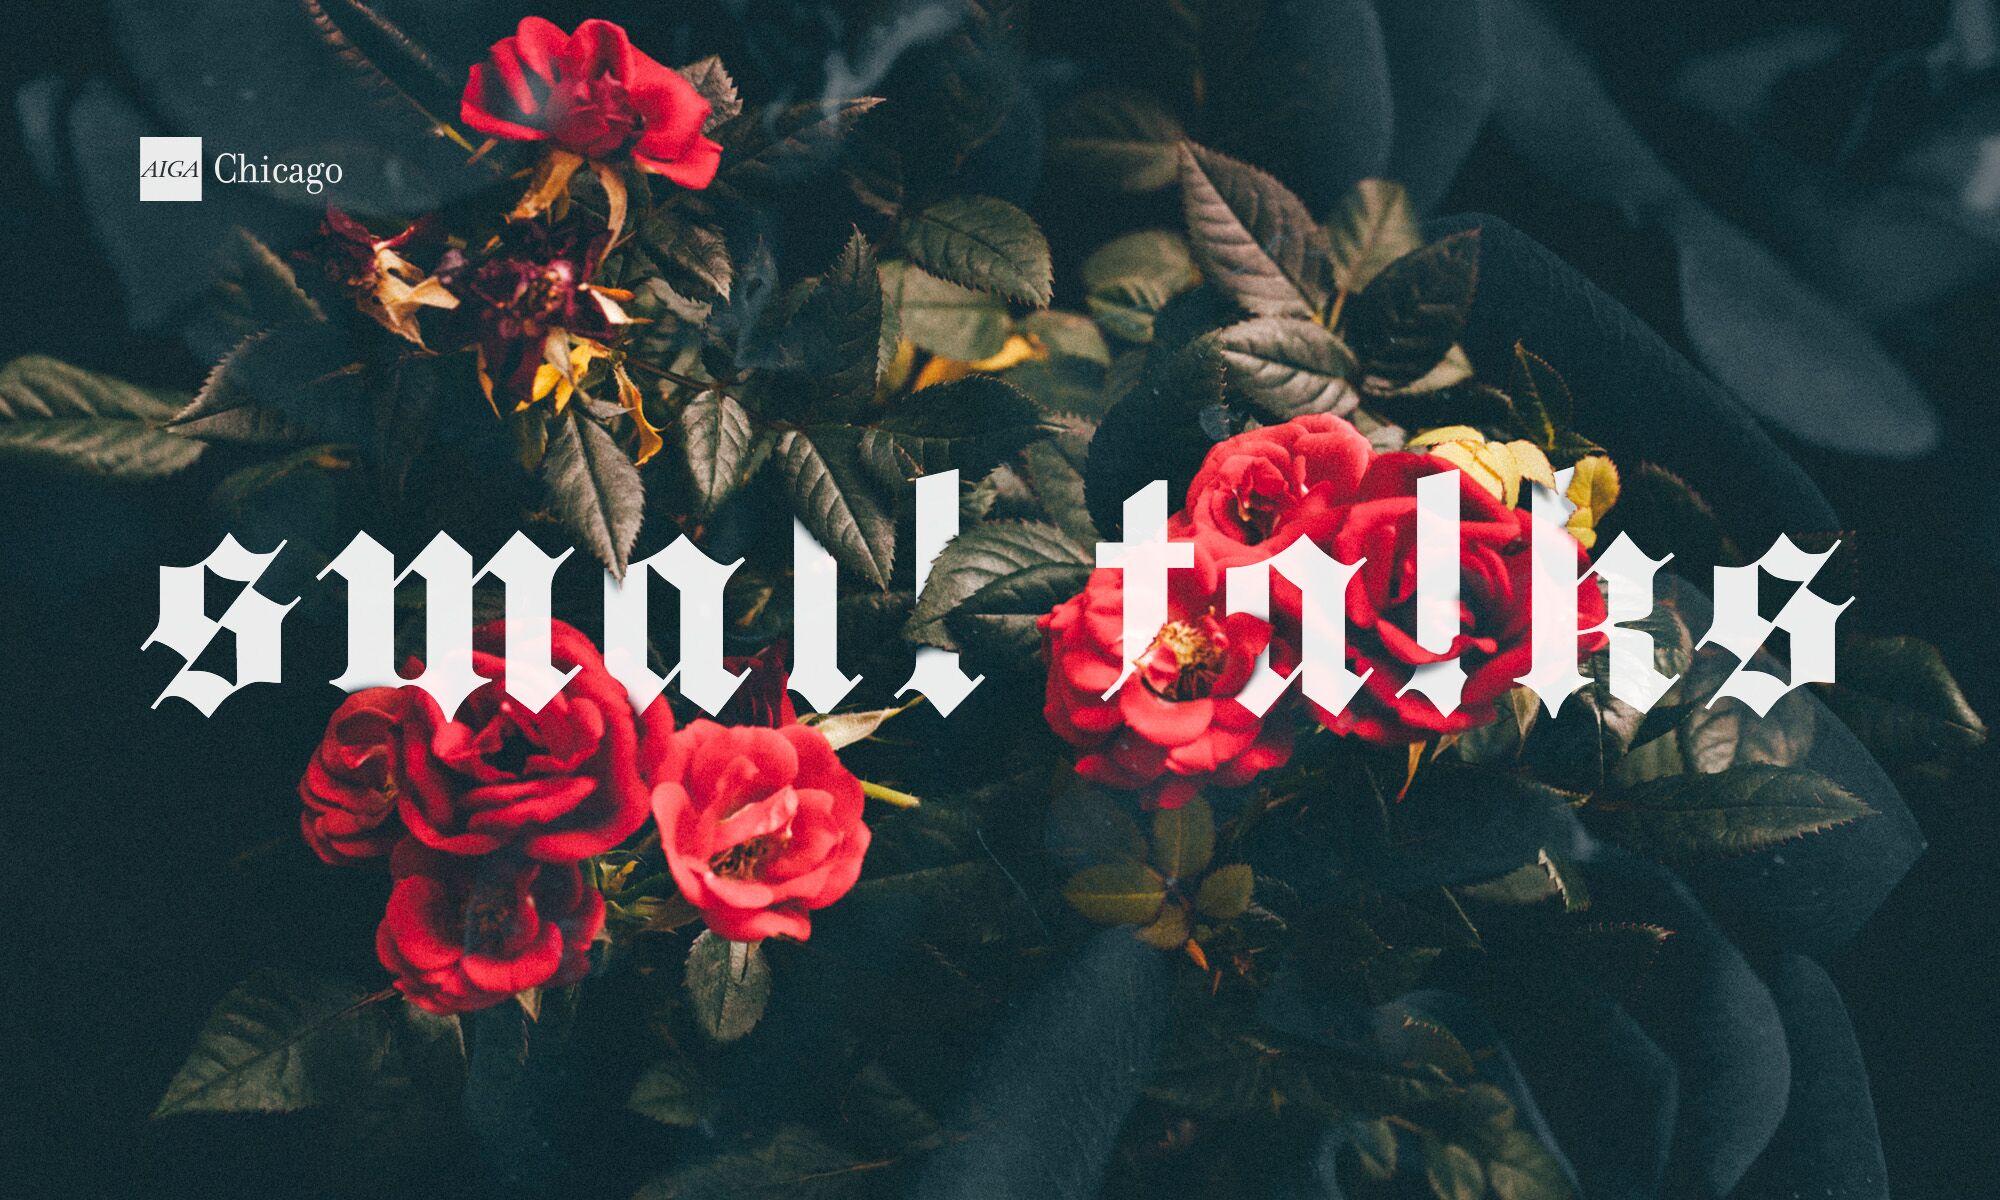 AIGA Chicago 'Small Talks'